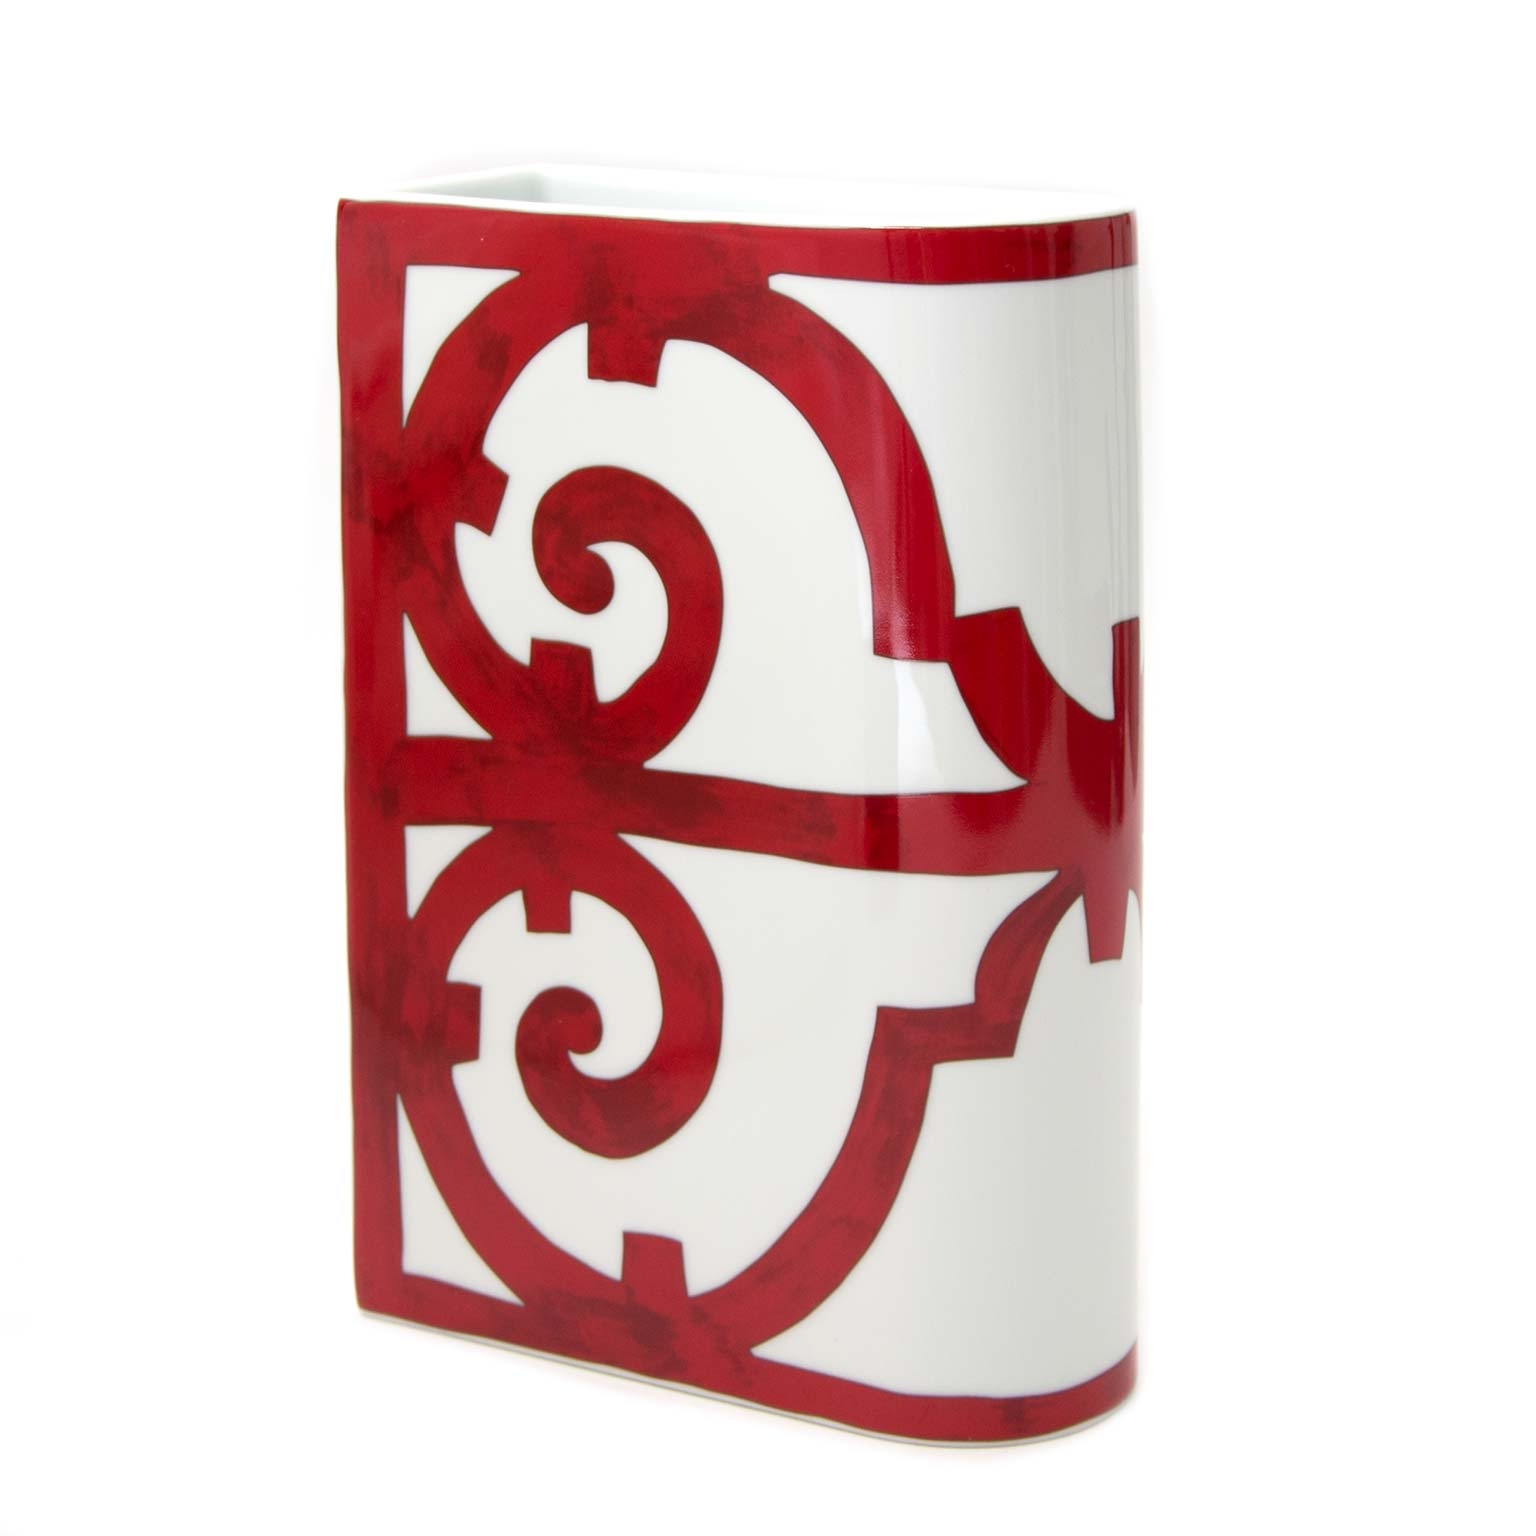 Hermès Balcon du Guadalquivir Vase Large Buy authentic designer hermes secondhand vase at Labellov at the best price. Safe and secure shopping. Koop tweedehands authentieke hermes vaas bij designer webwinkel labellov.